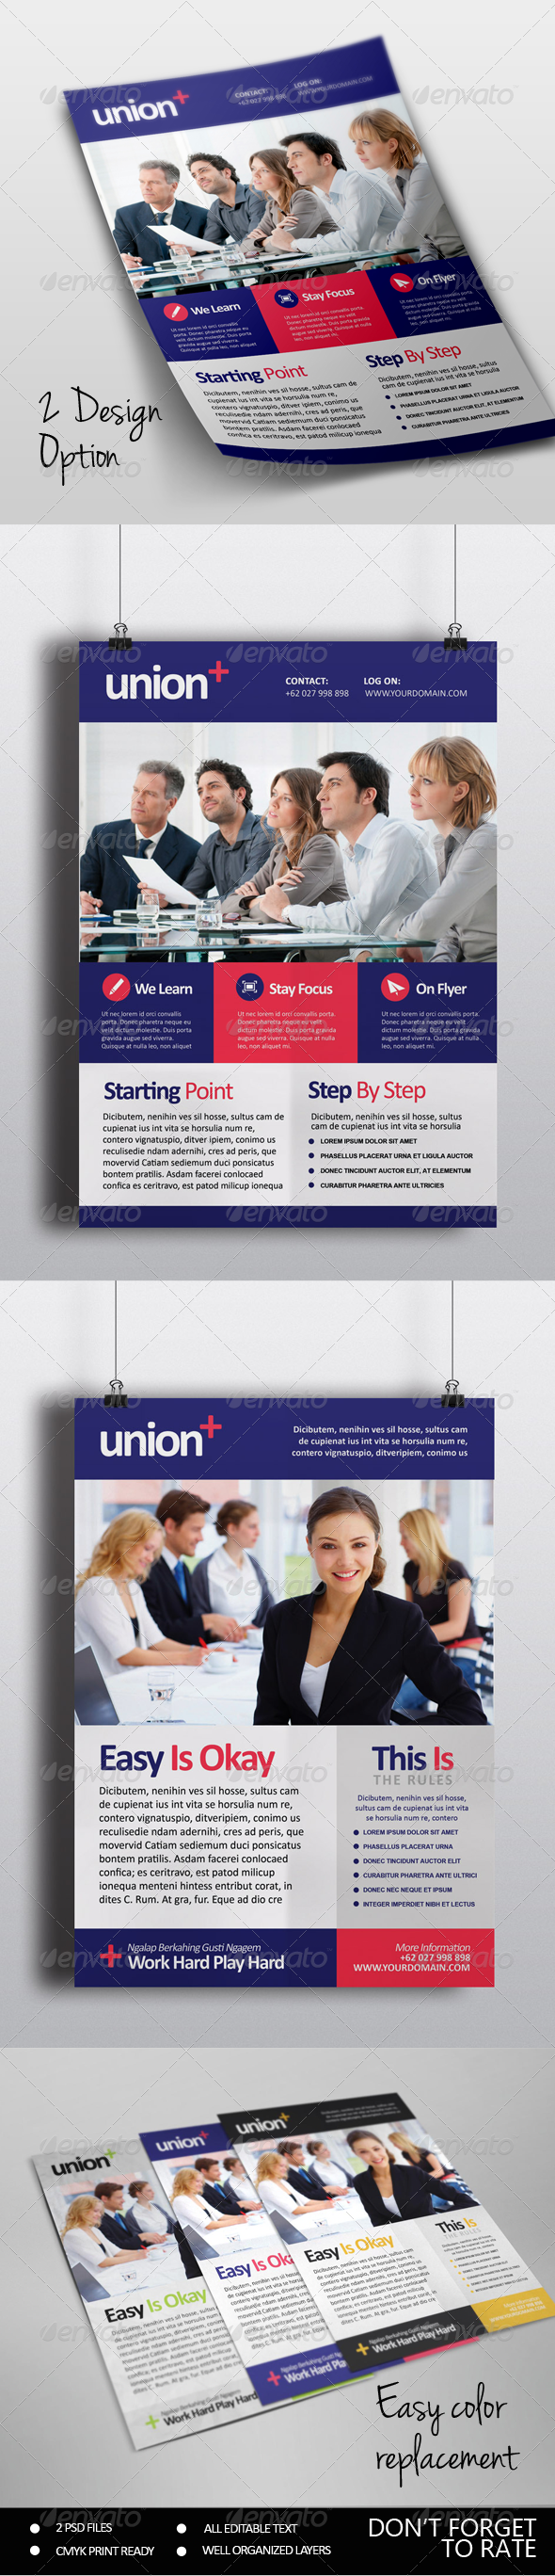 Union - Multipurpose Flyer Template - Corporate Flyers